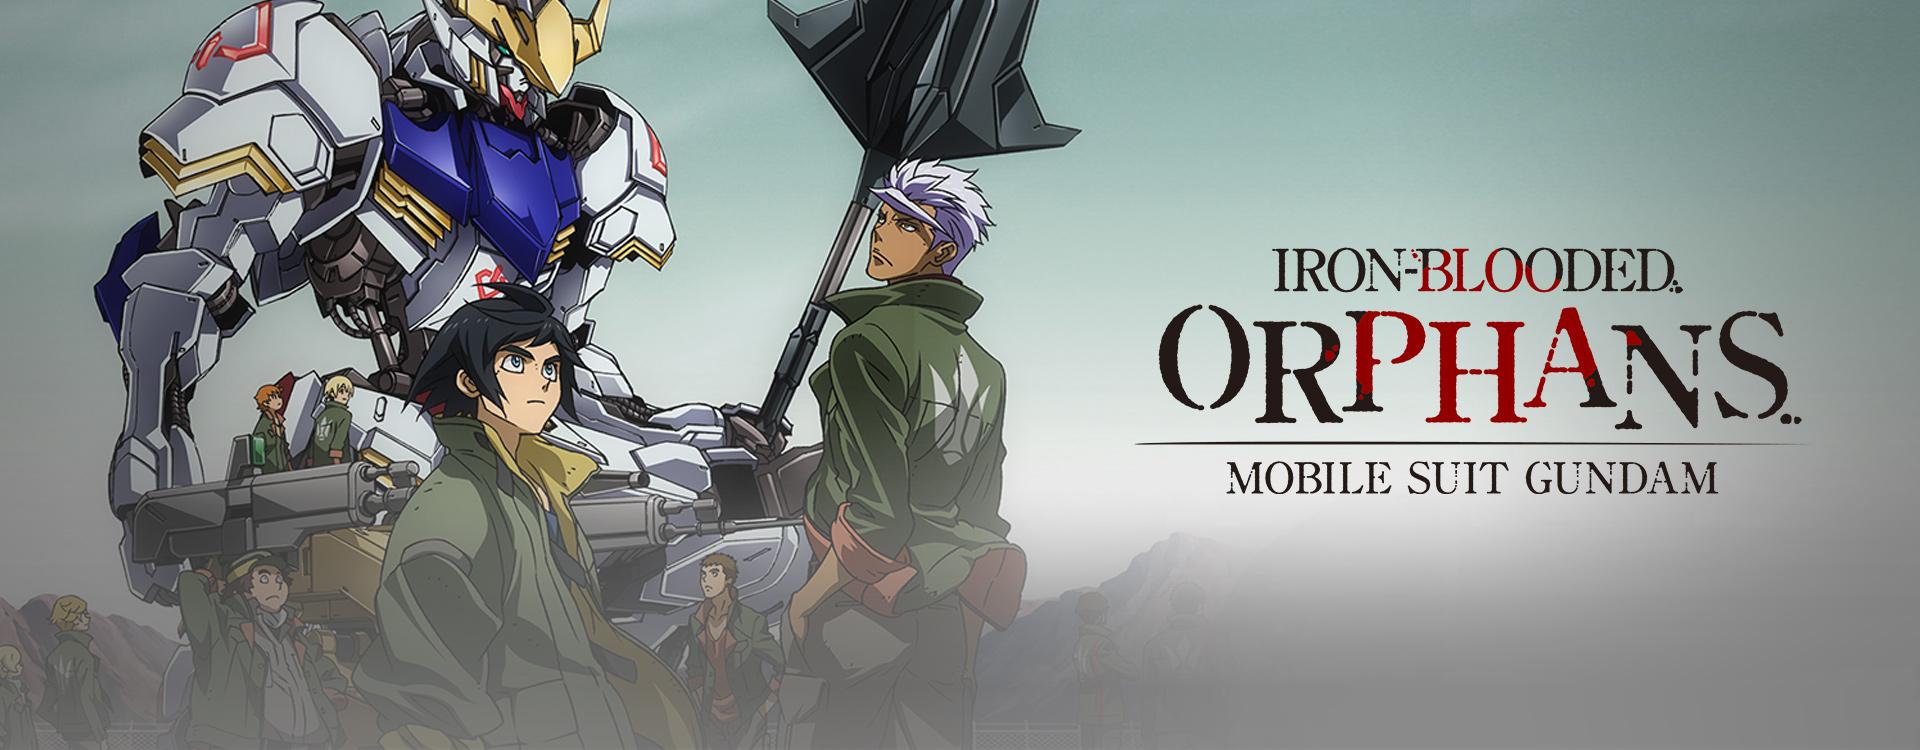 mobil anime izle: dragon ball super